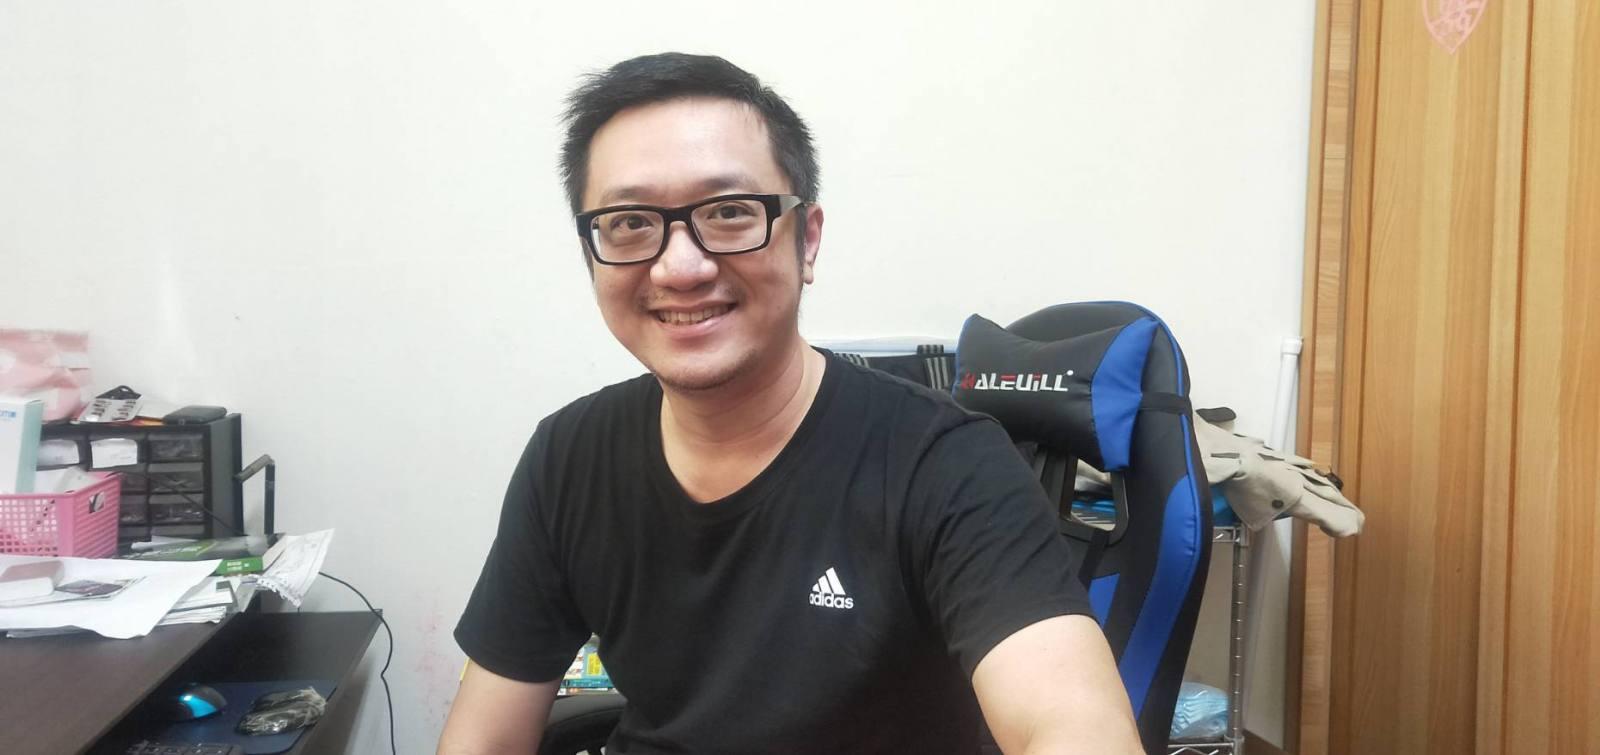 https://www.bounbang.com/blog/07a2cc24612e3326.jpg